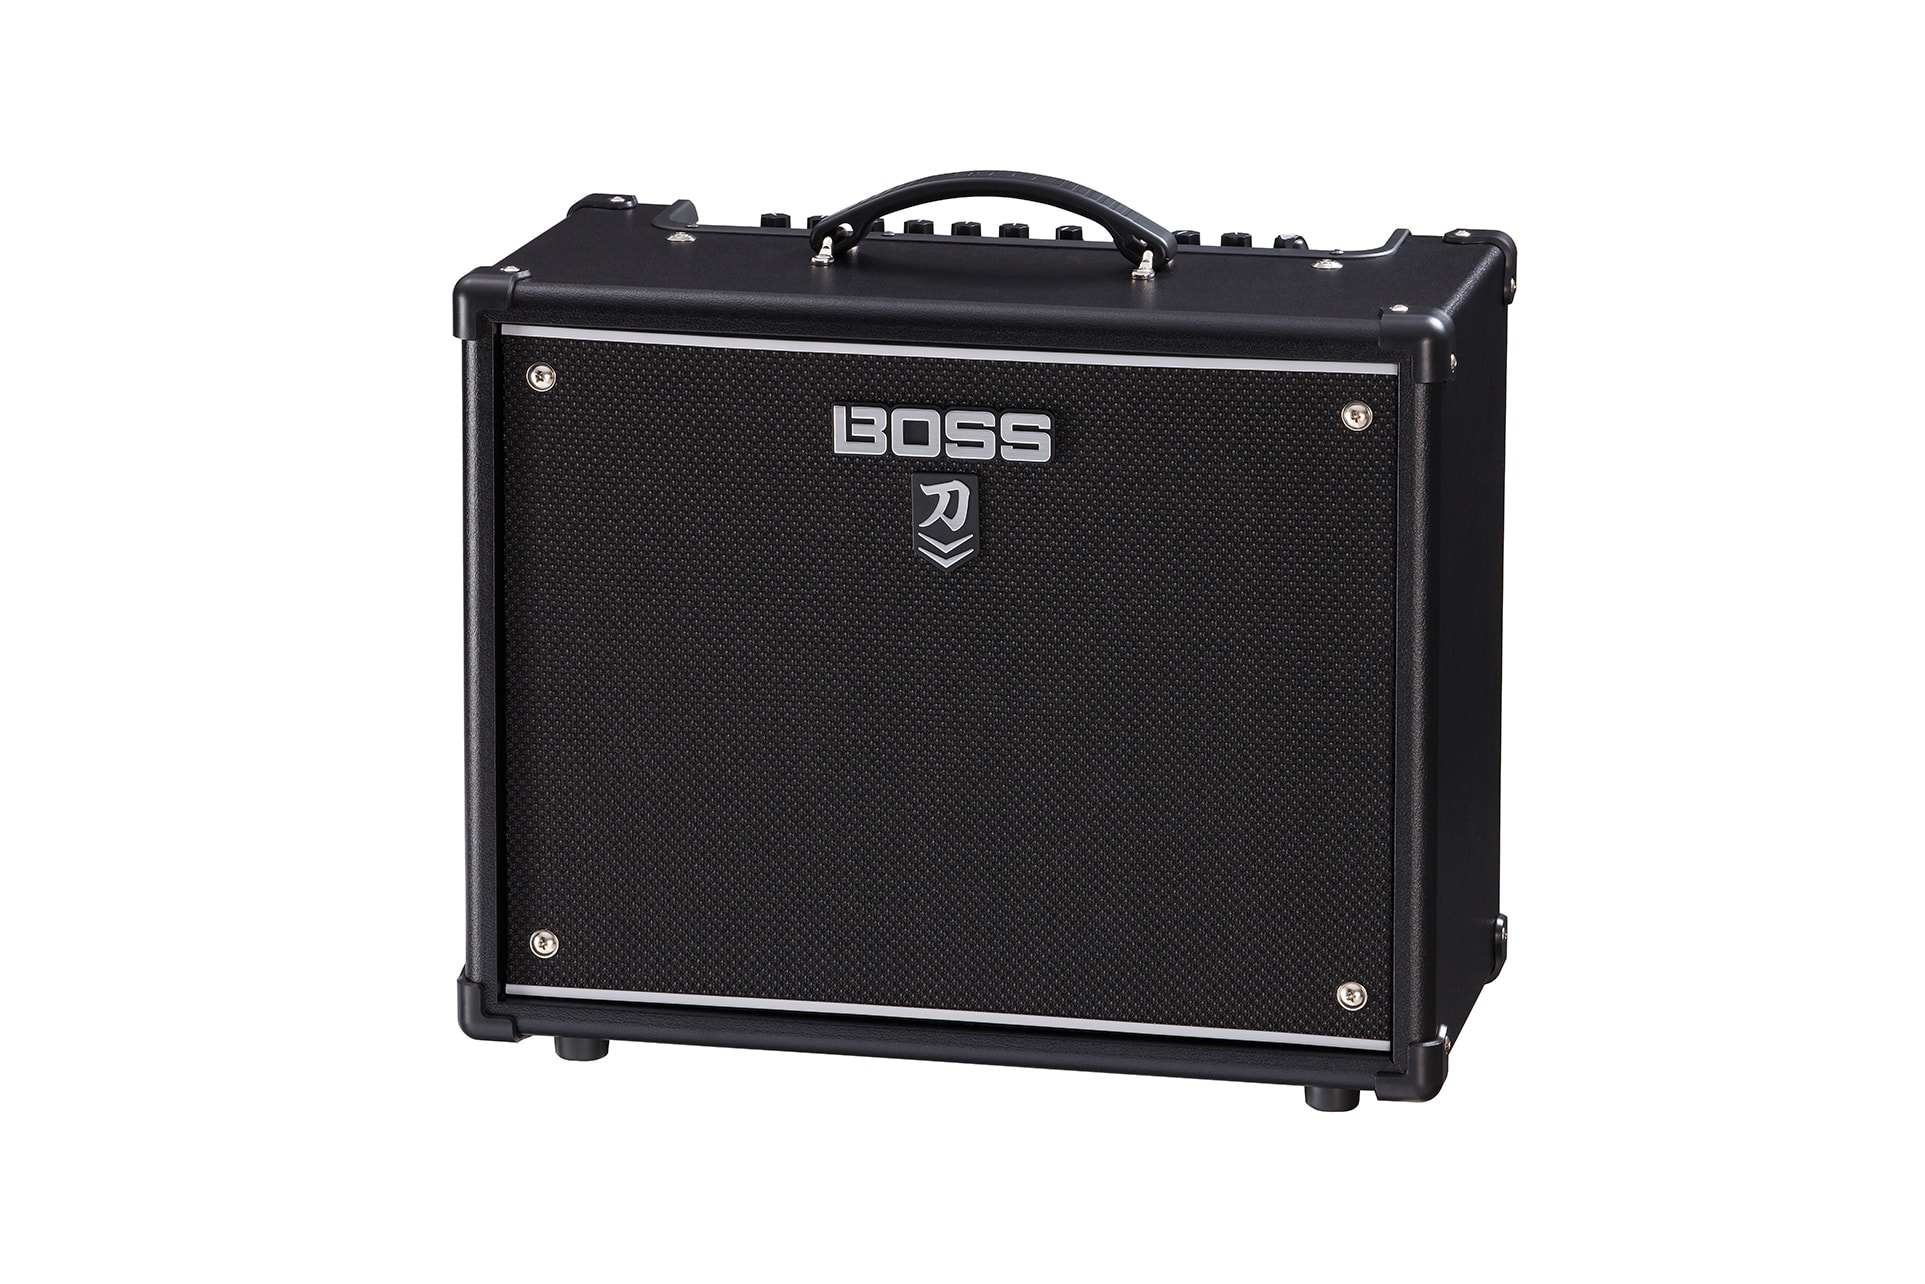 boss ktn 50 katana mkii guitar amplifier solo guitars. Black Bedroom Furniture Sets. Home Design Ideas